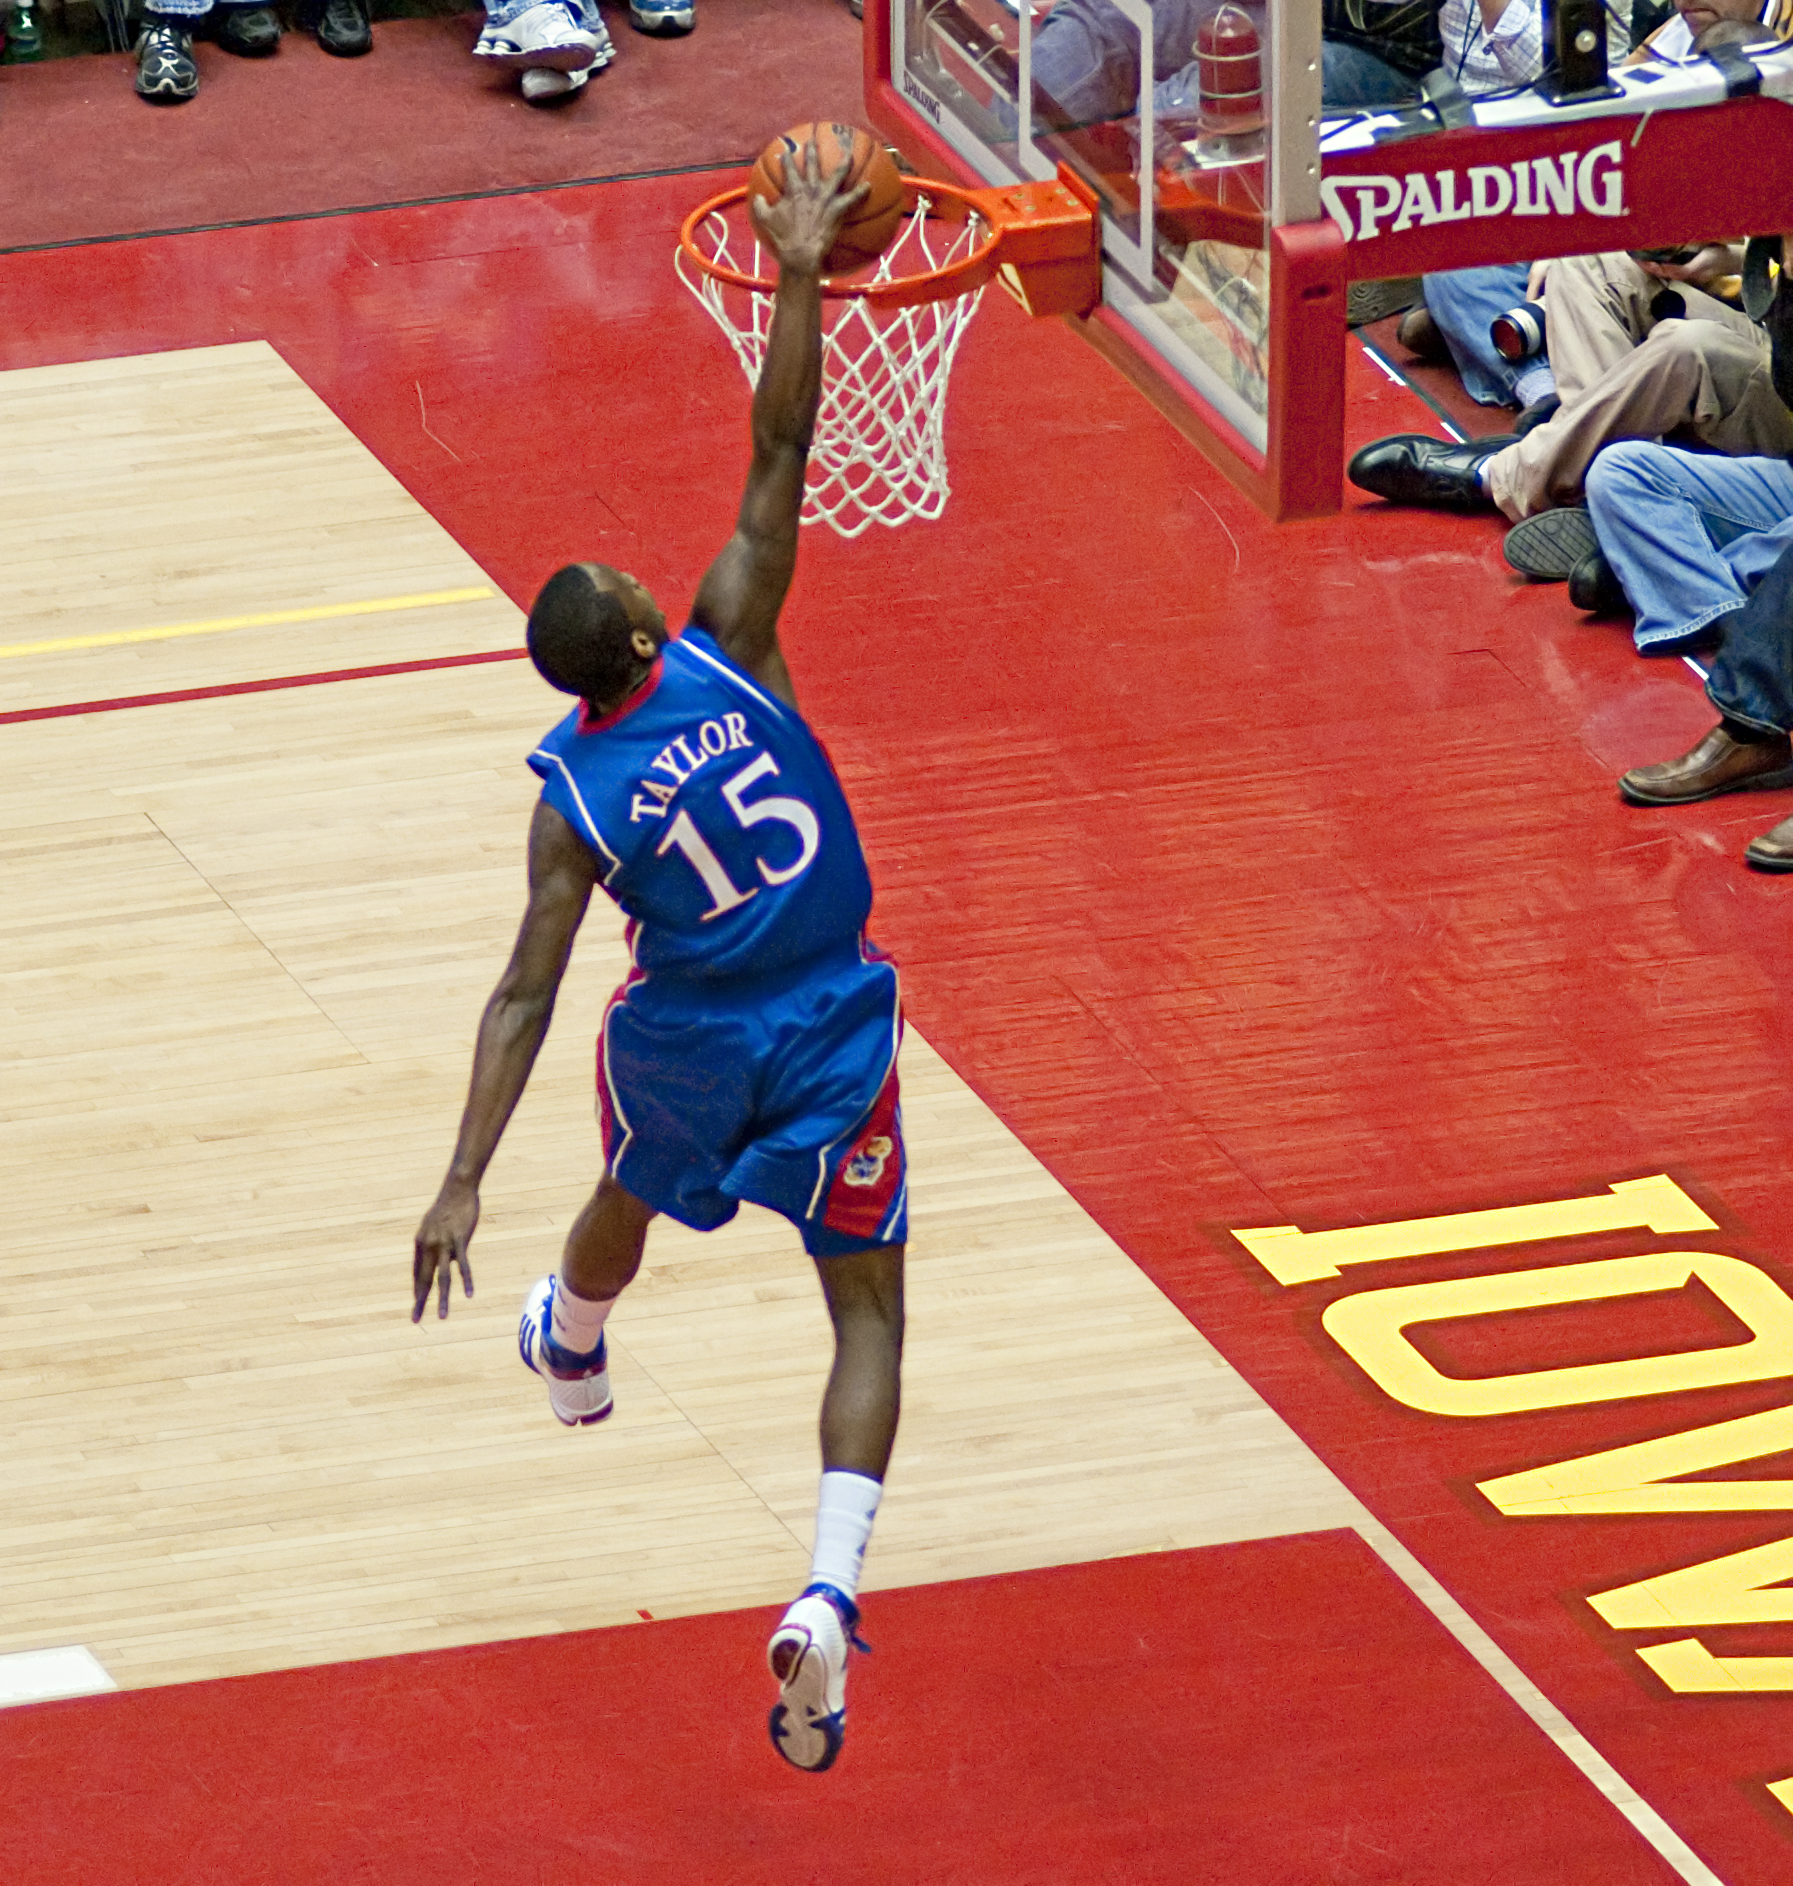 Blazers Basketball Reference: Tyshawn Taylor